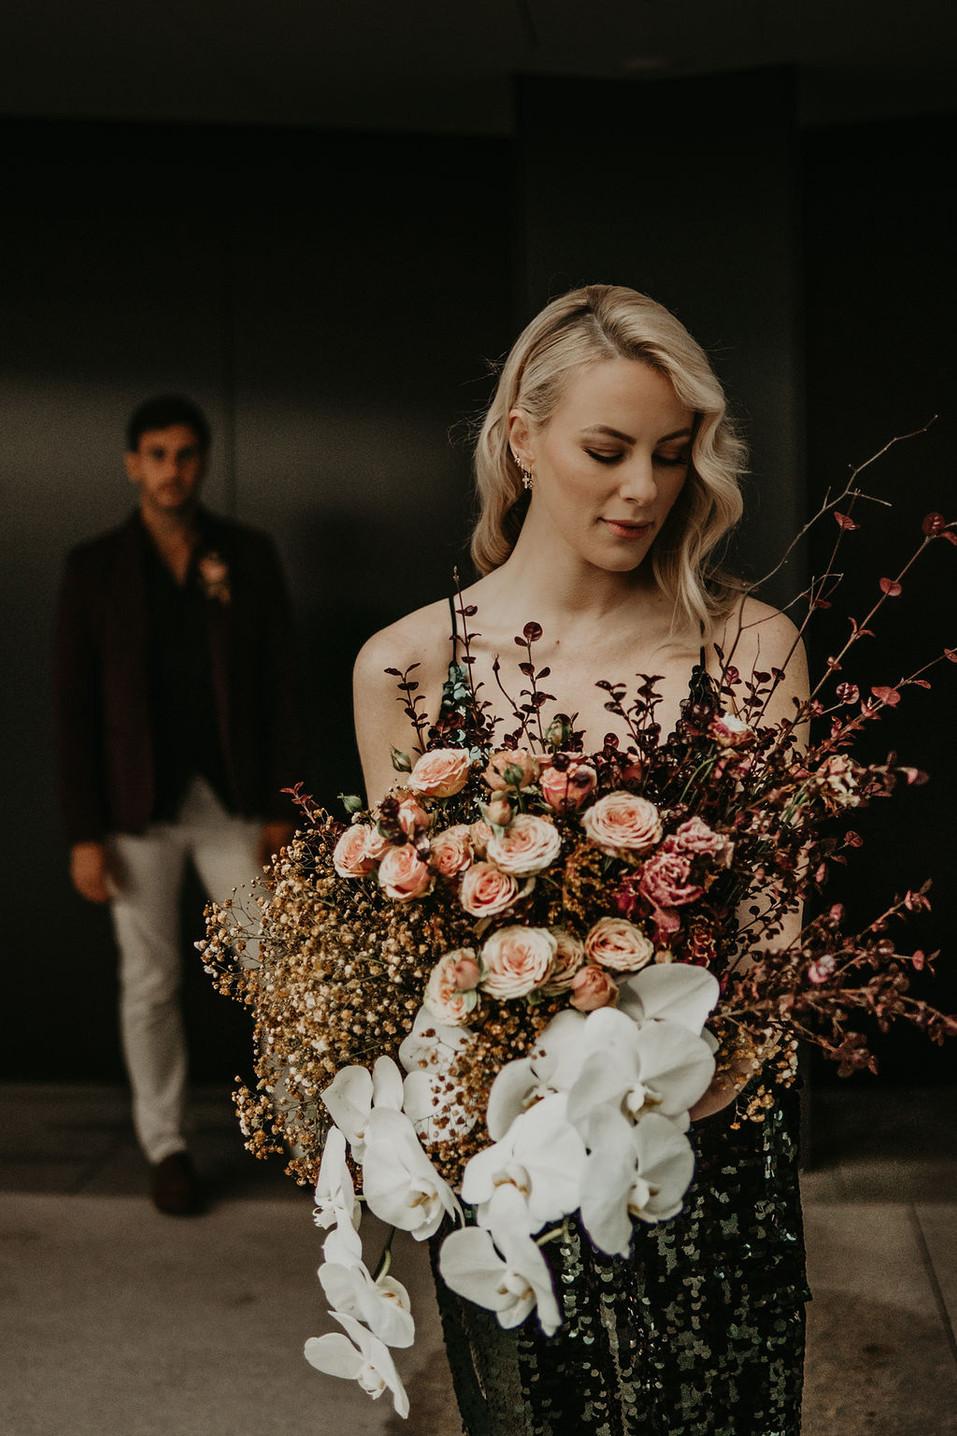 freo-urban-wedding-shoot-84.jpg